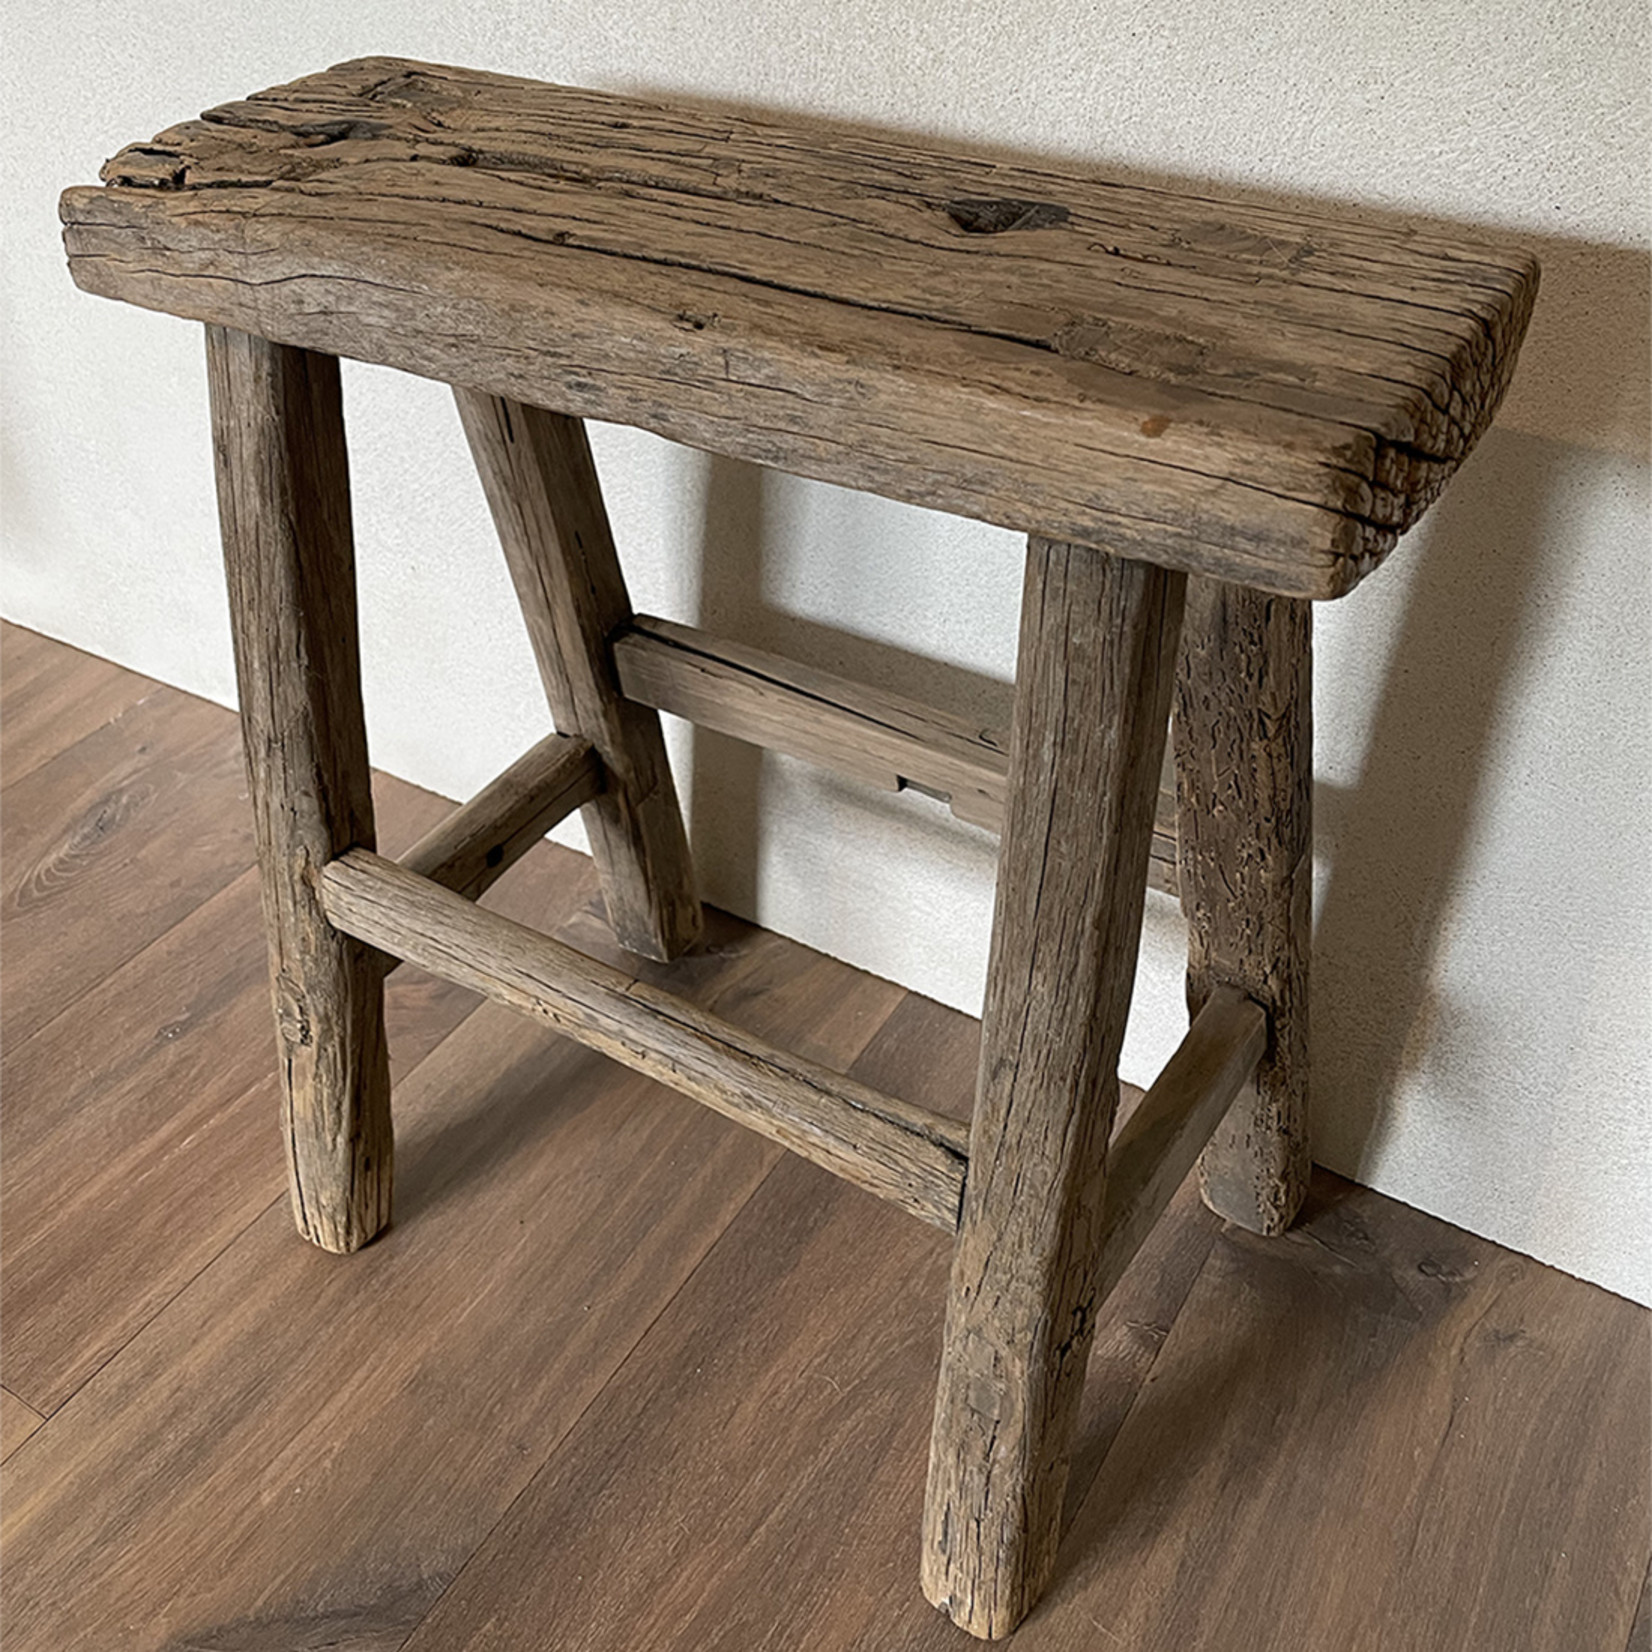 Olm stool °2